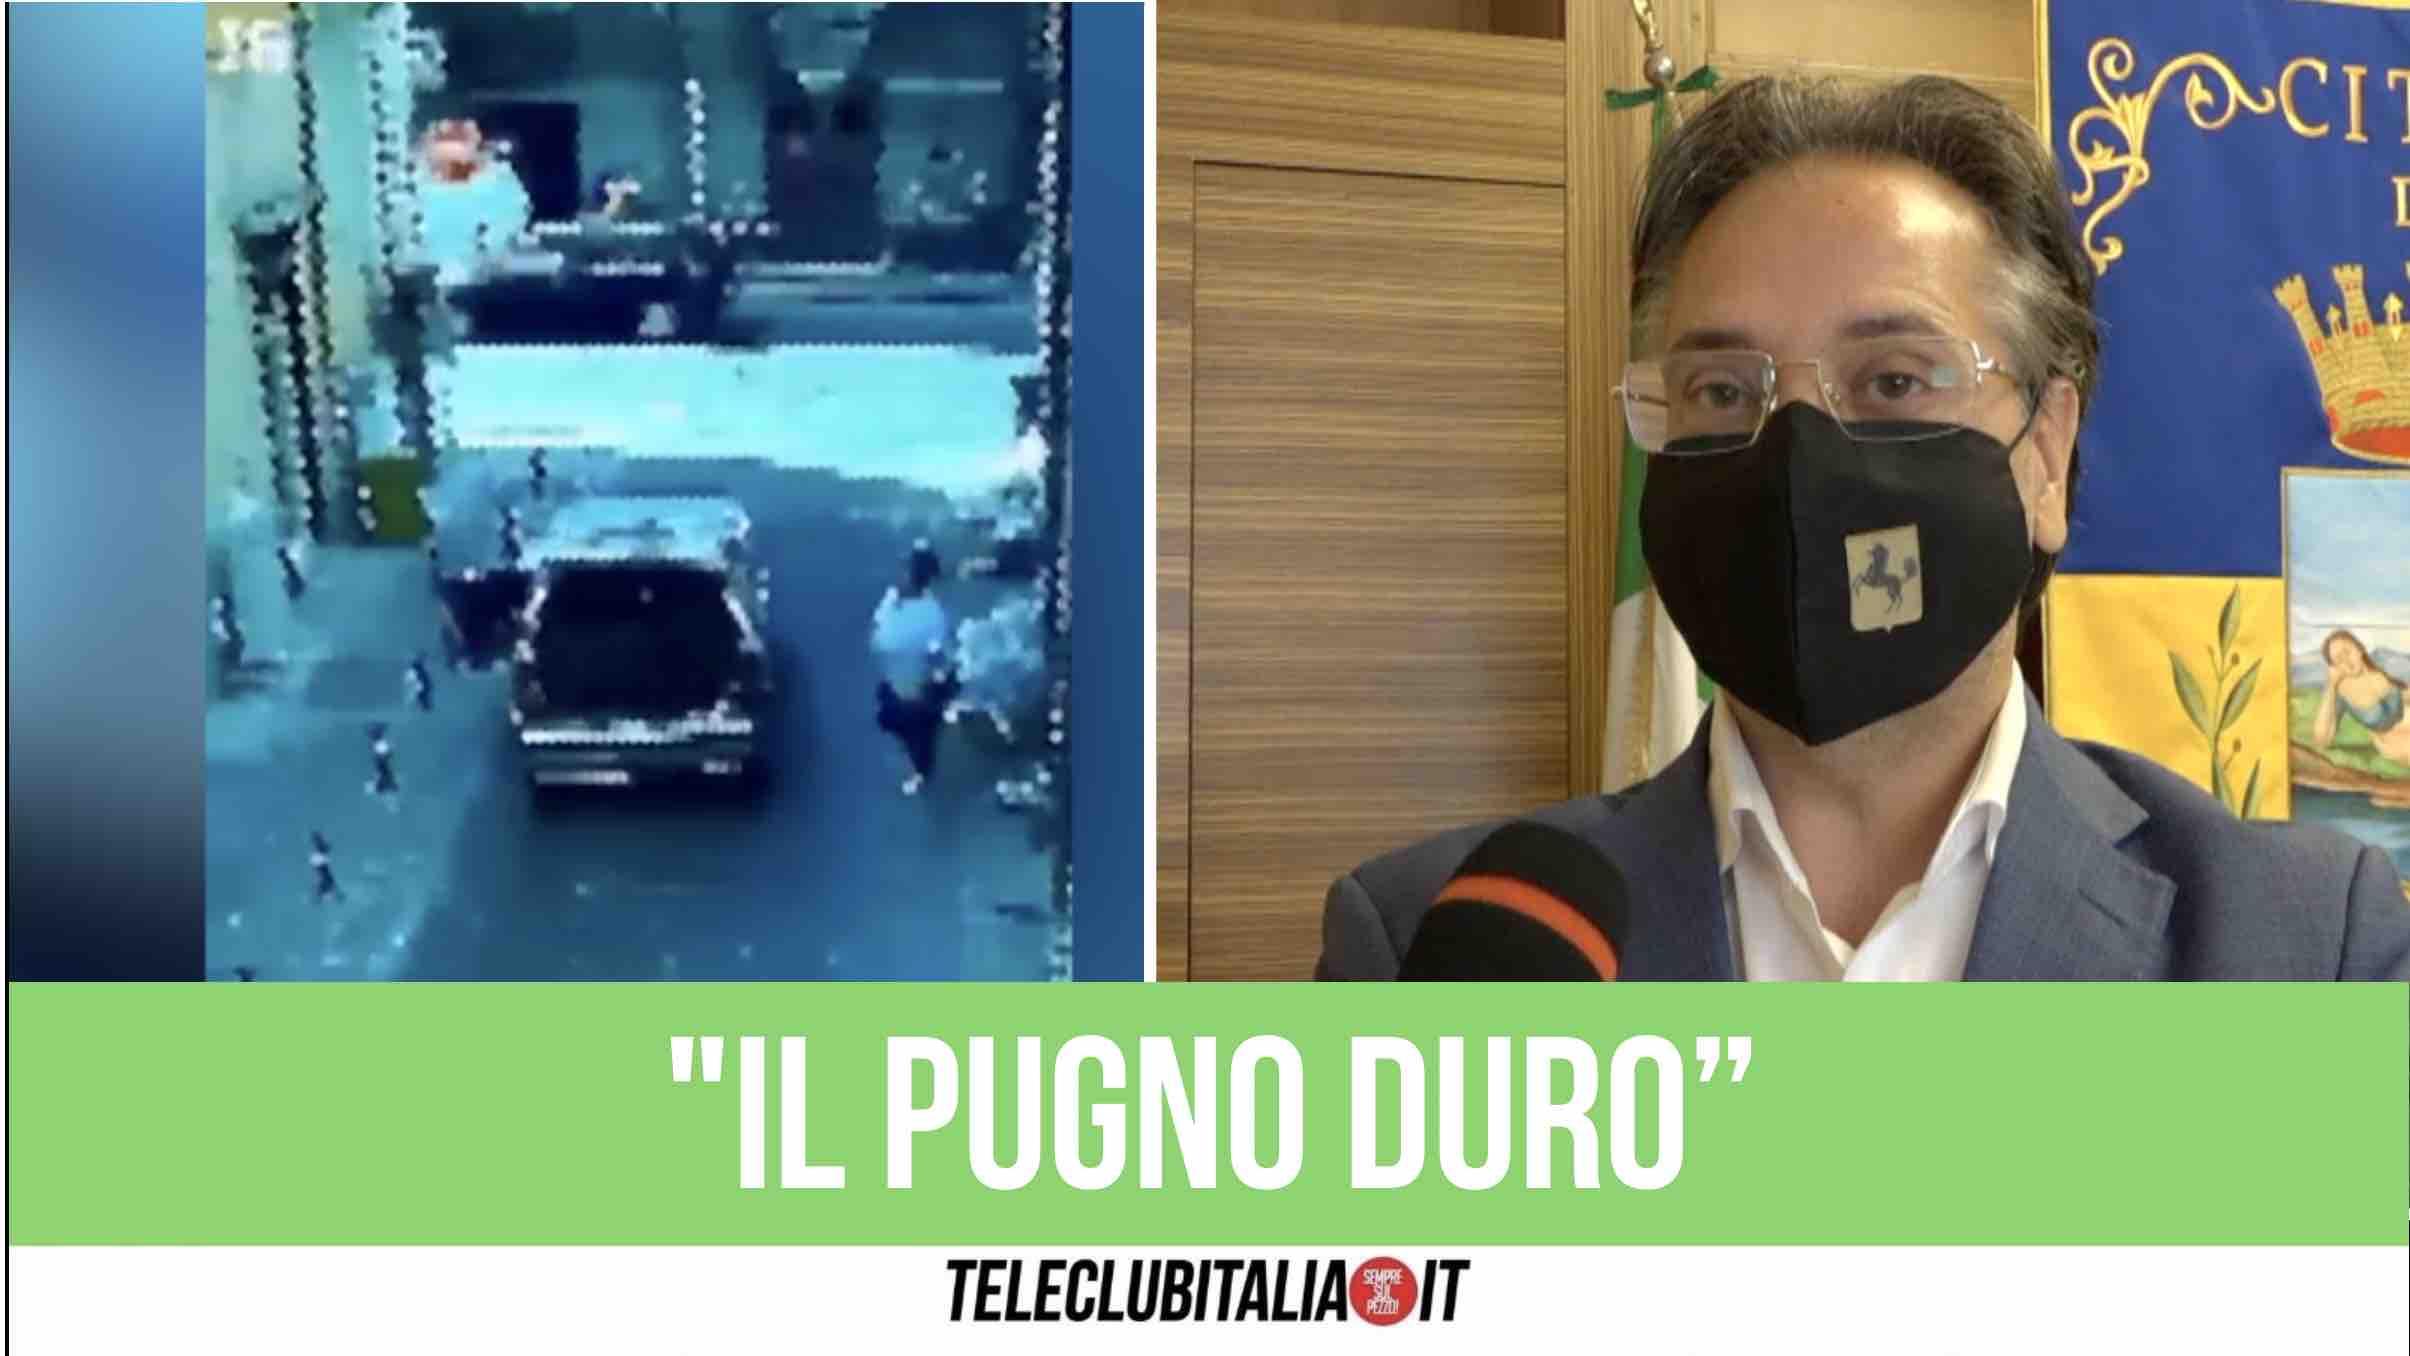 sindaco giugliano nicola pirozzi rifiuti abbandono multe